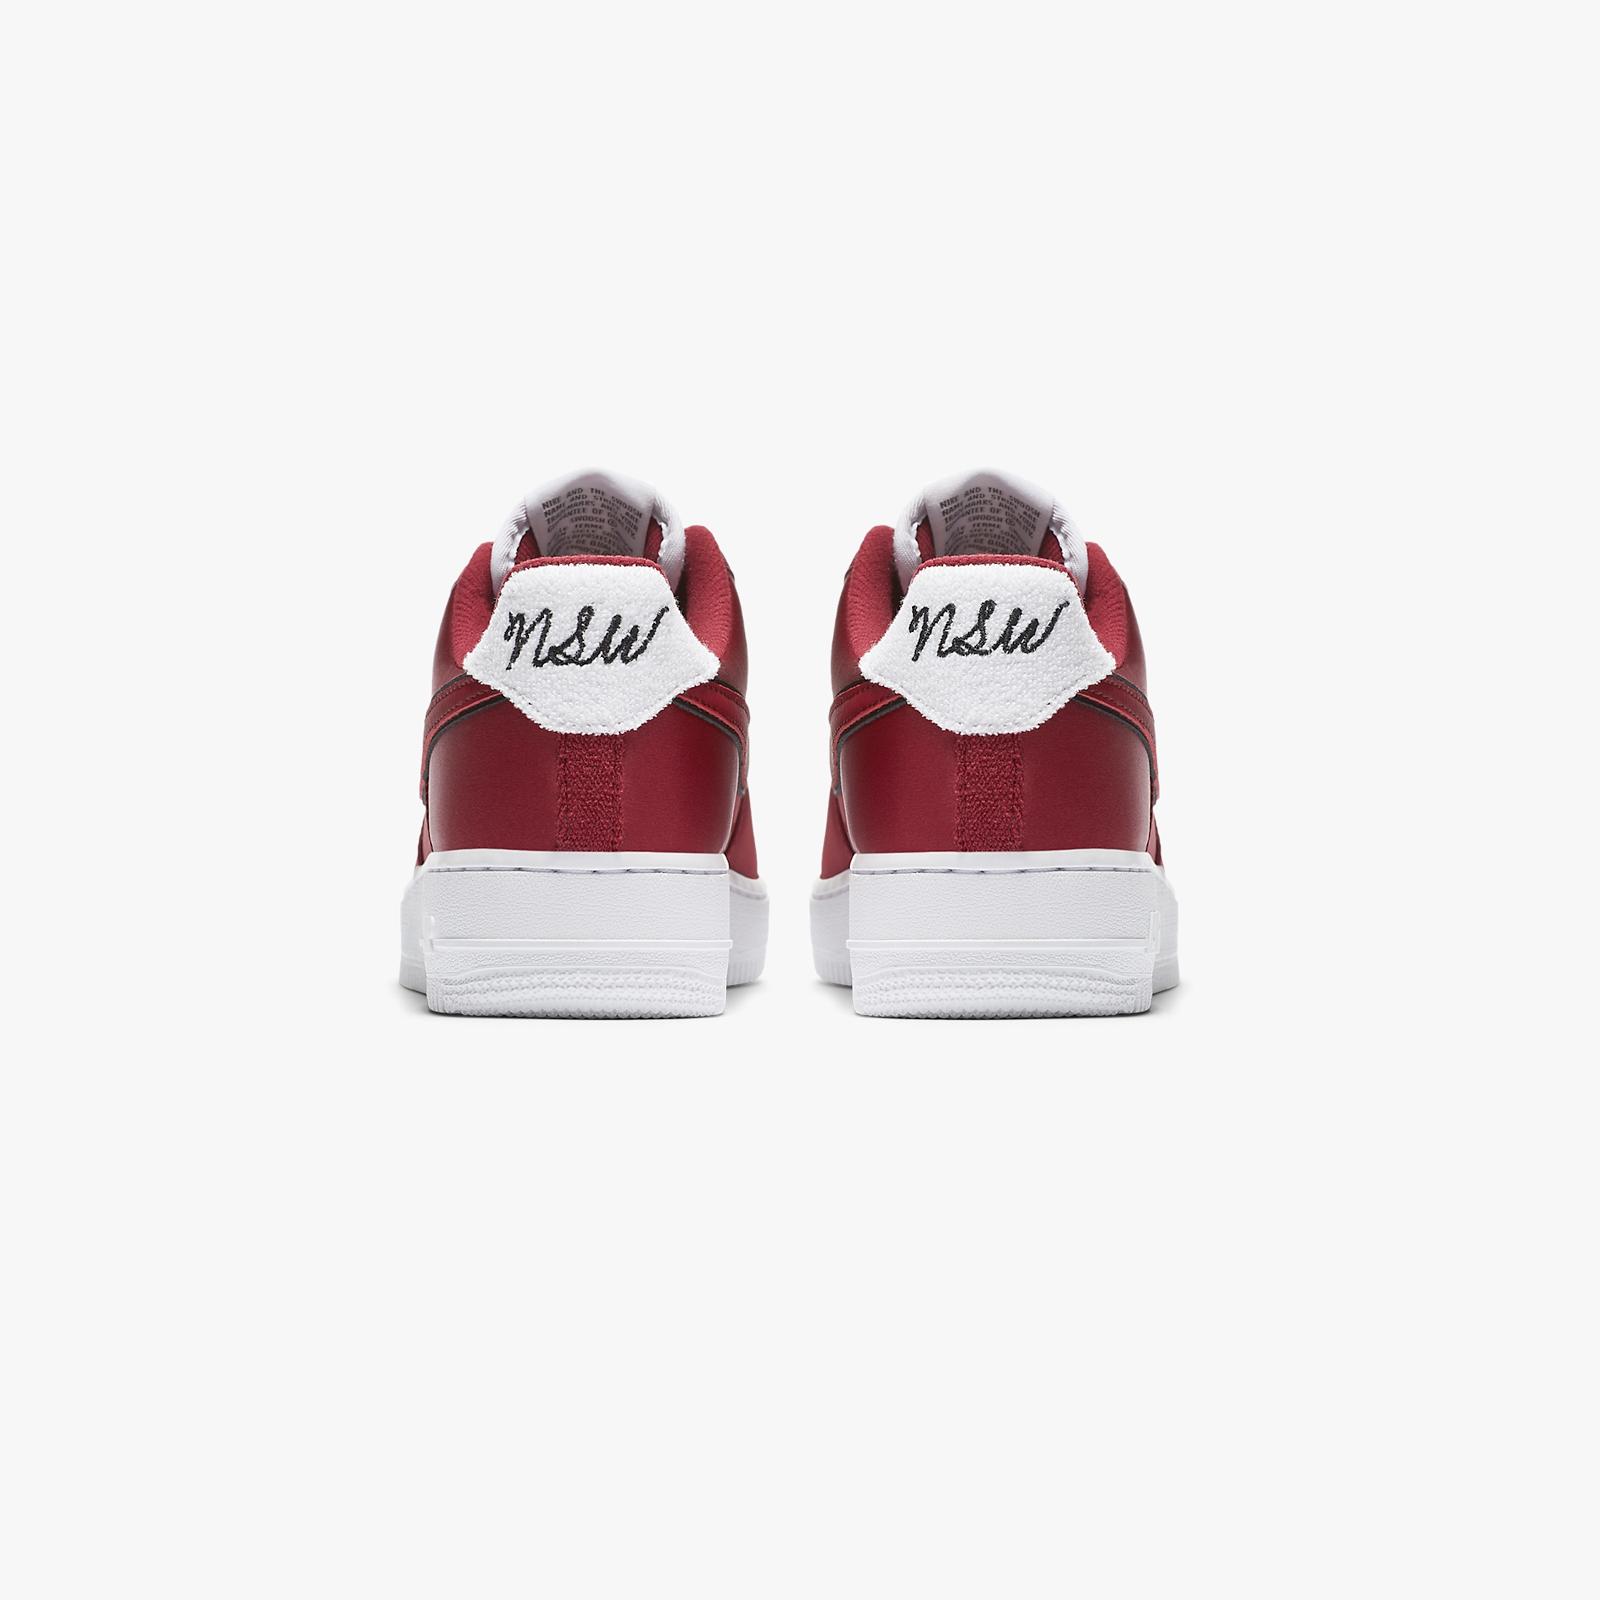 brand new 58011 ae1a6 Nike Sportswear Wmns Air Force 1 07 SE - 6. Close